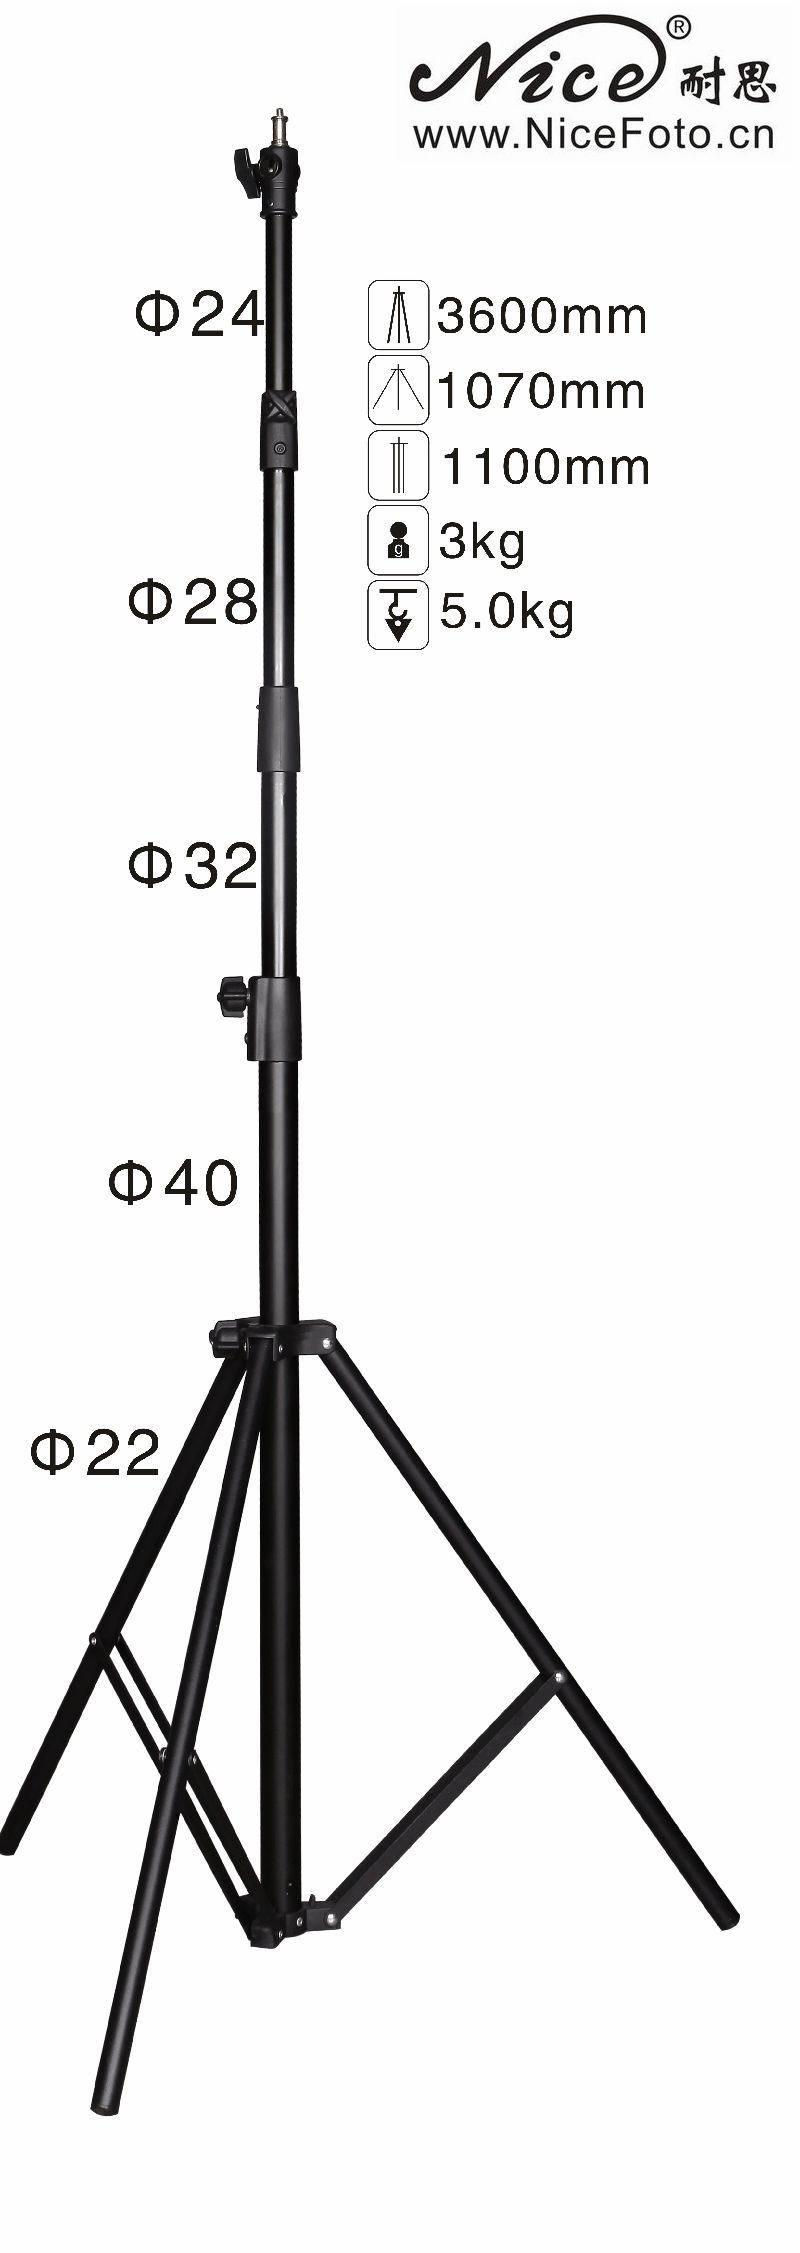 Adearstudio Air cushion light stand flash light lamp holder 360cm ls-360at no00d jb300 pro premium grade light stand 2 8m stand with air cushion professional air cushioned light stand no00dc